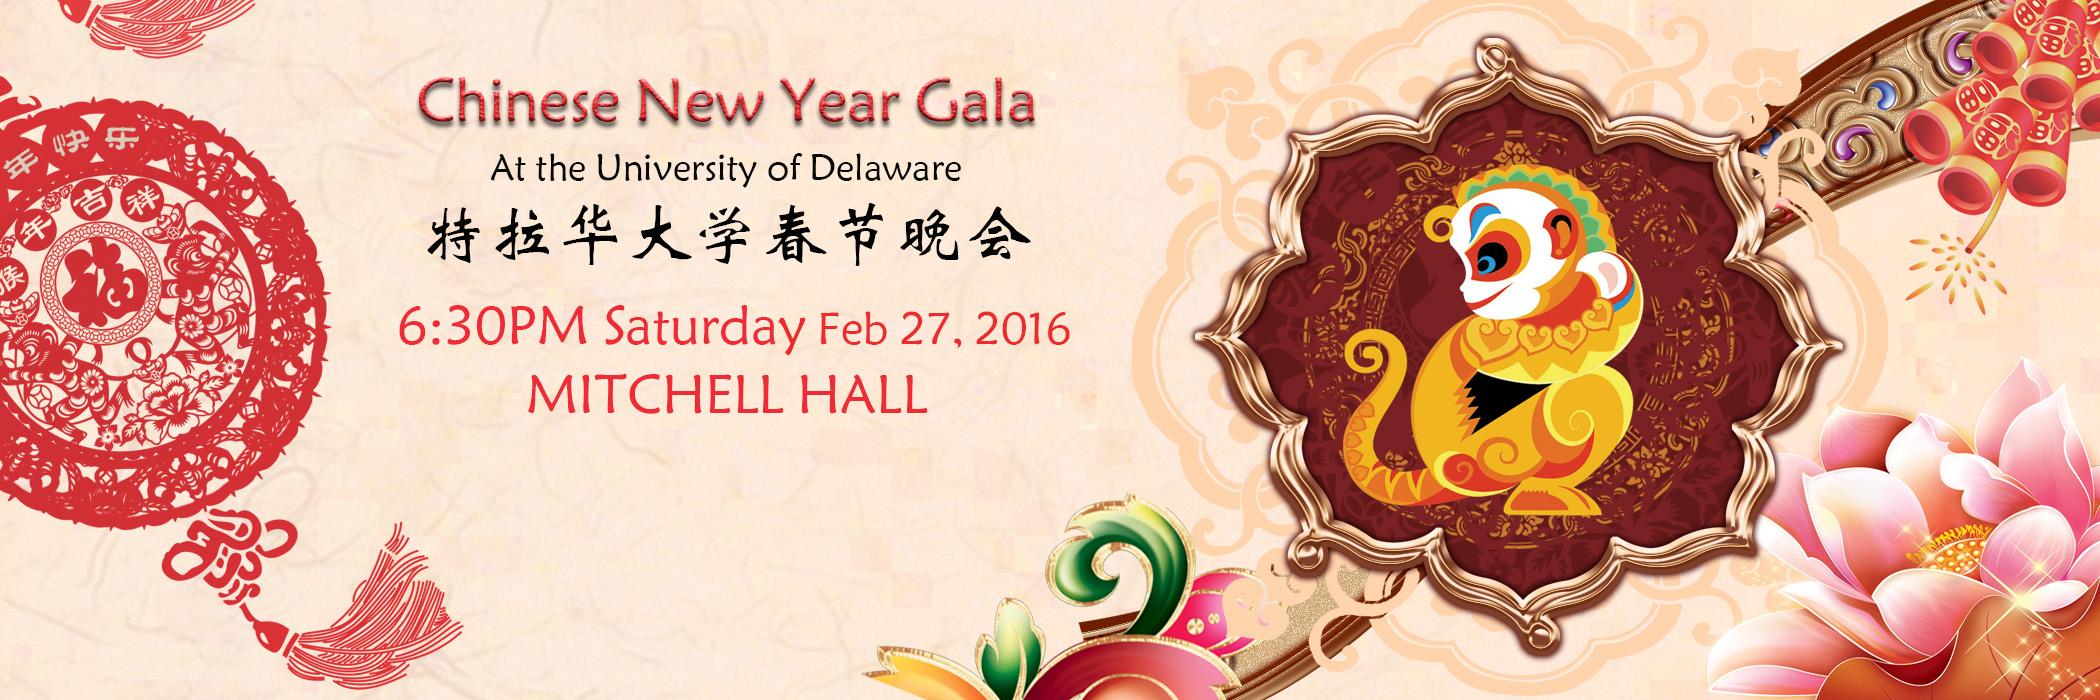 2016 UD Chinese New Year Gala